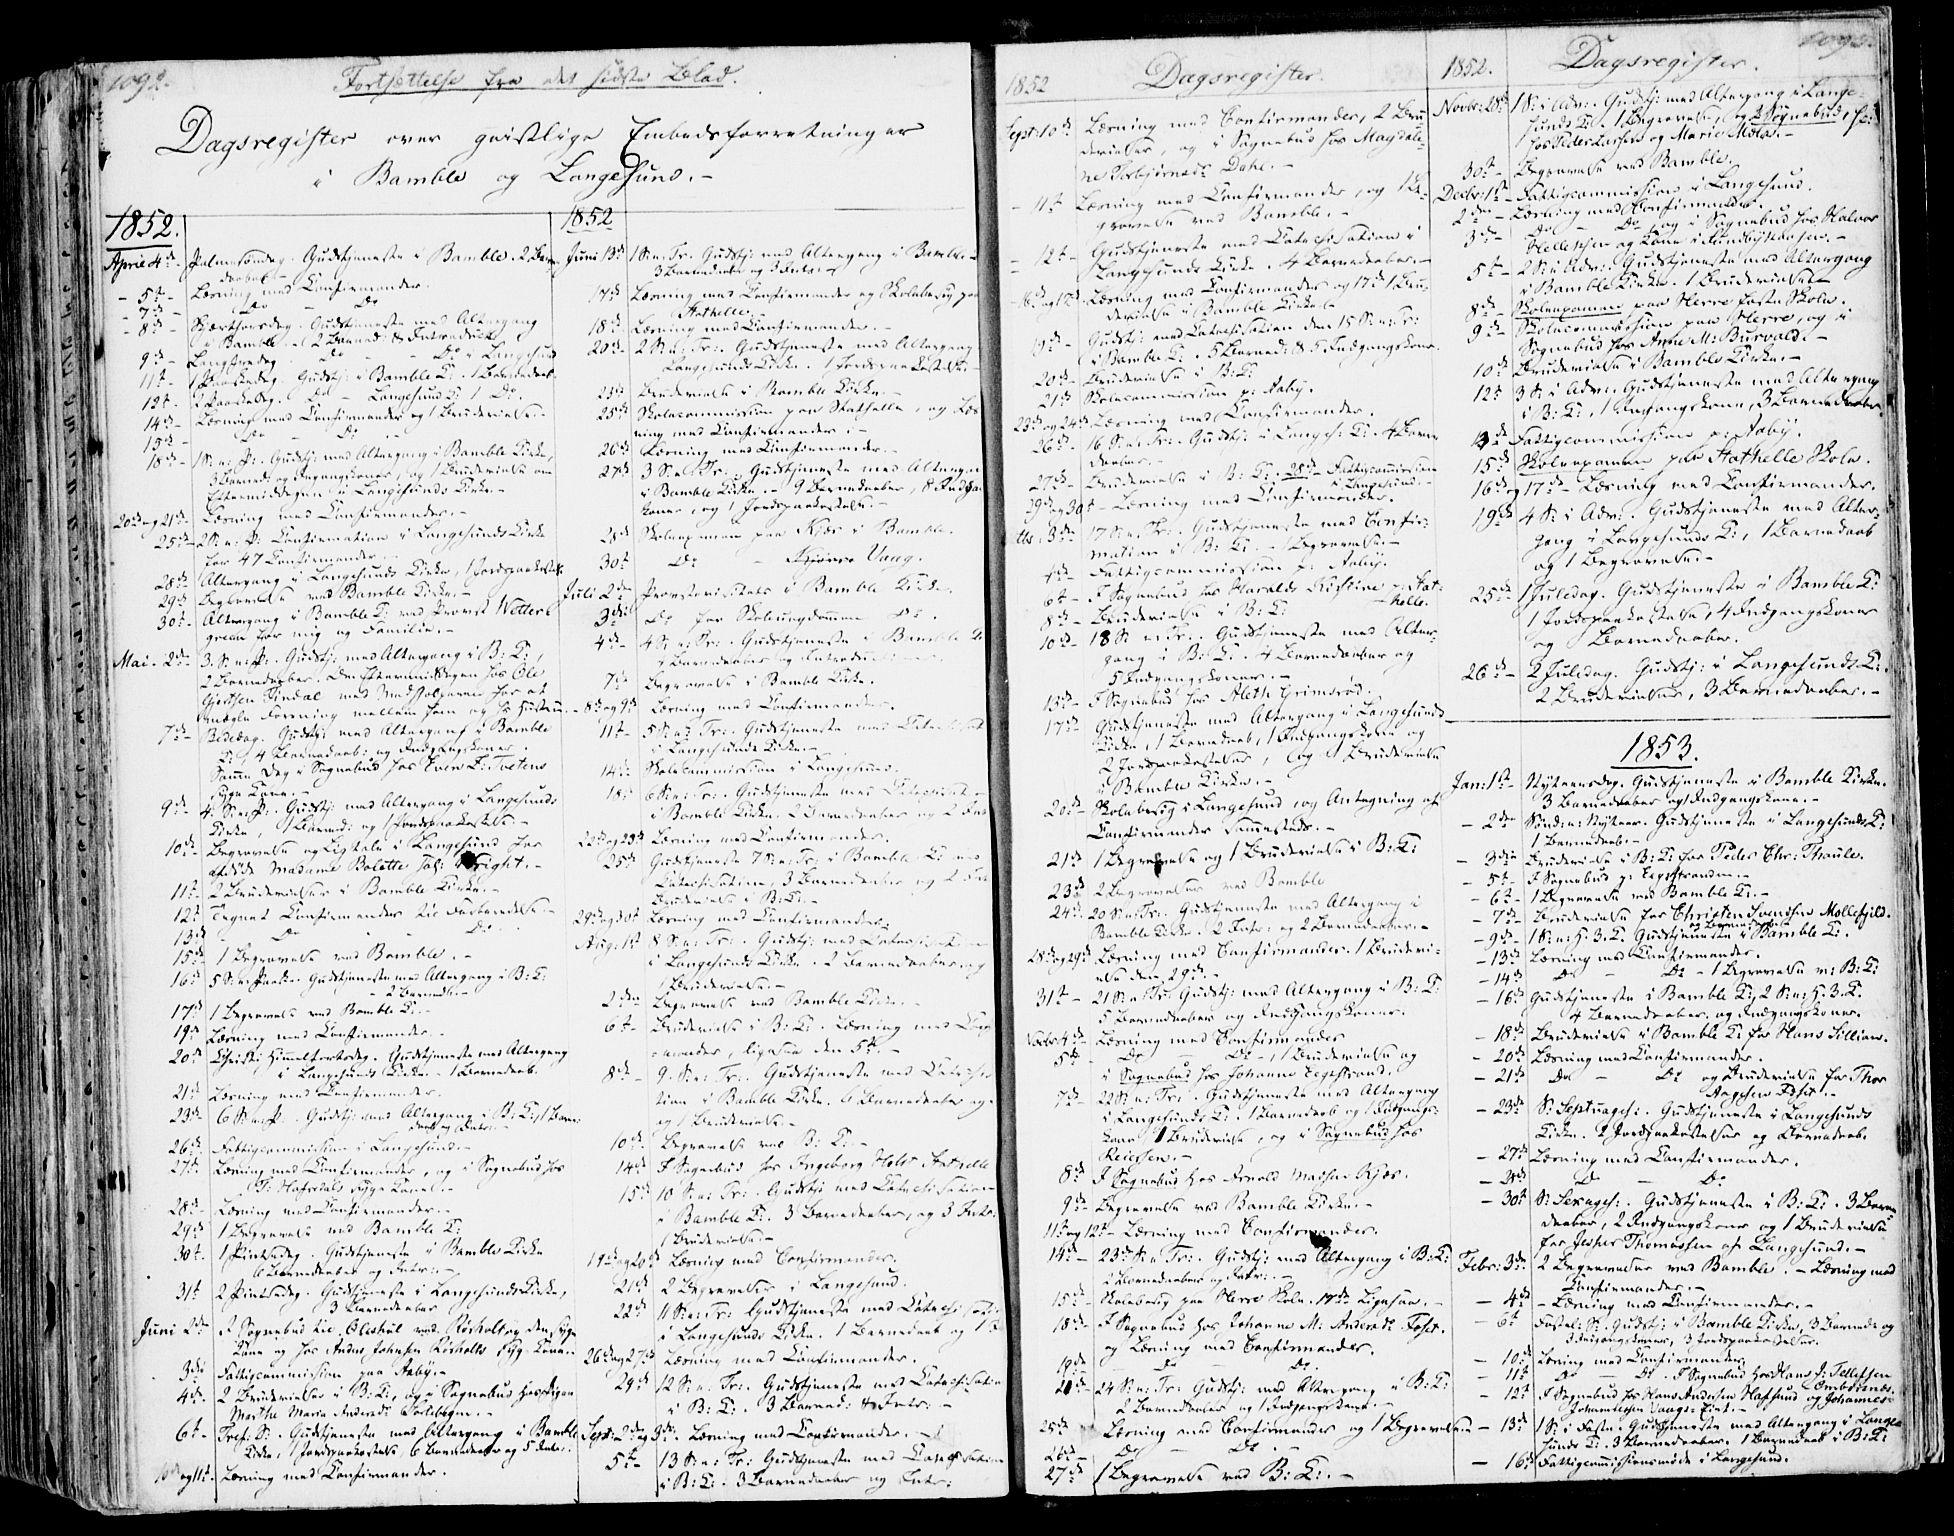 SAKO, Bamble kirkebøker, F/Fa/L0004: Ministerialbok nr. I 4, 1834-1853, s. 1092-1093